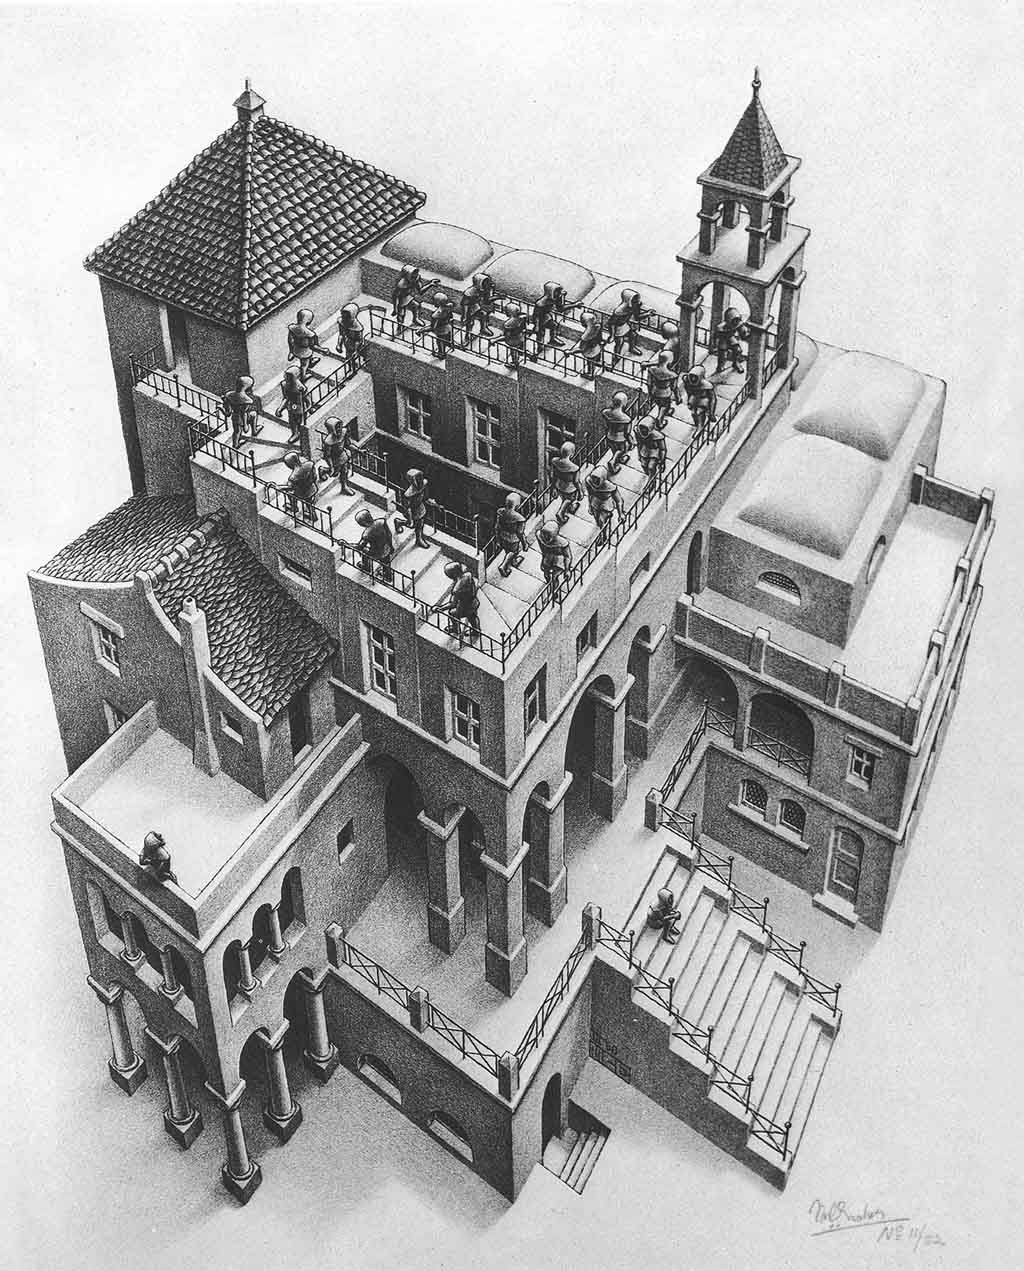 Tranh cuar M.C. Escher. Nguồn: meridian.net.au